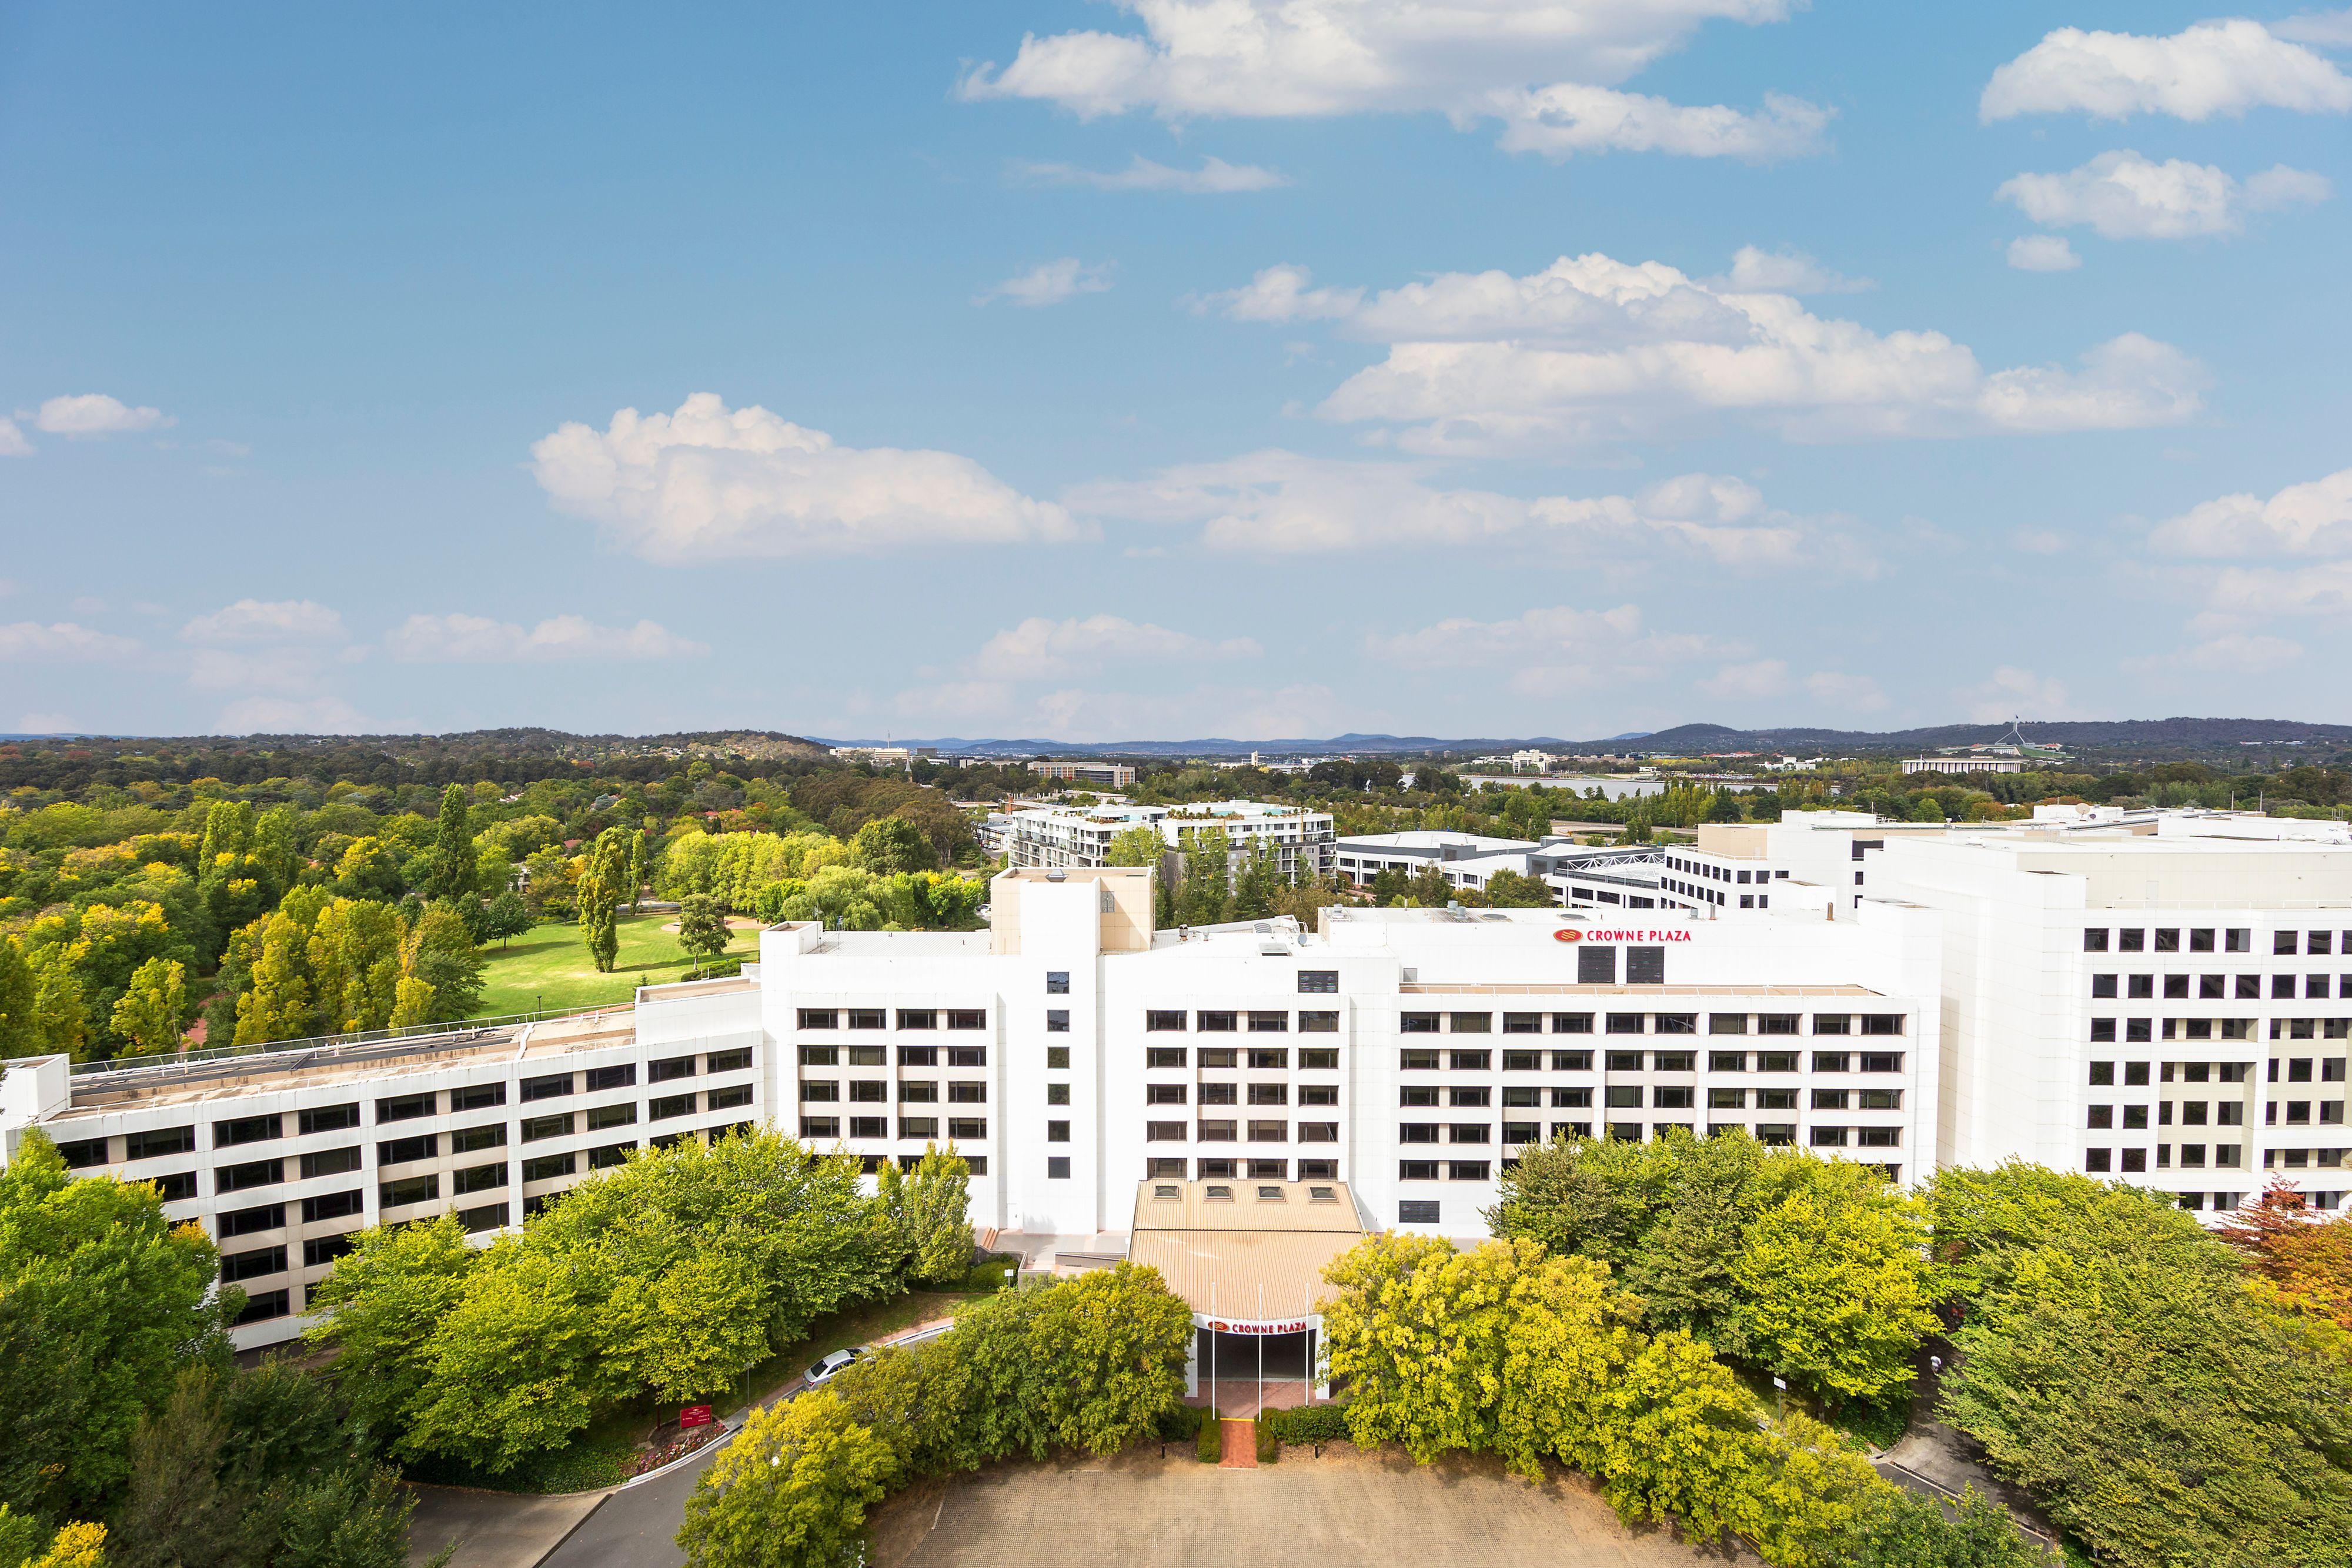 Crowne Plaza Canberra Canberra (02) 6274 5500